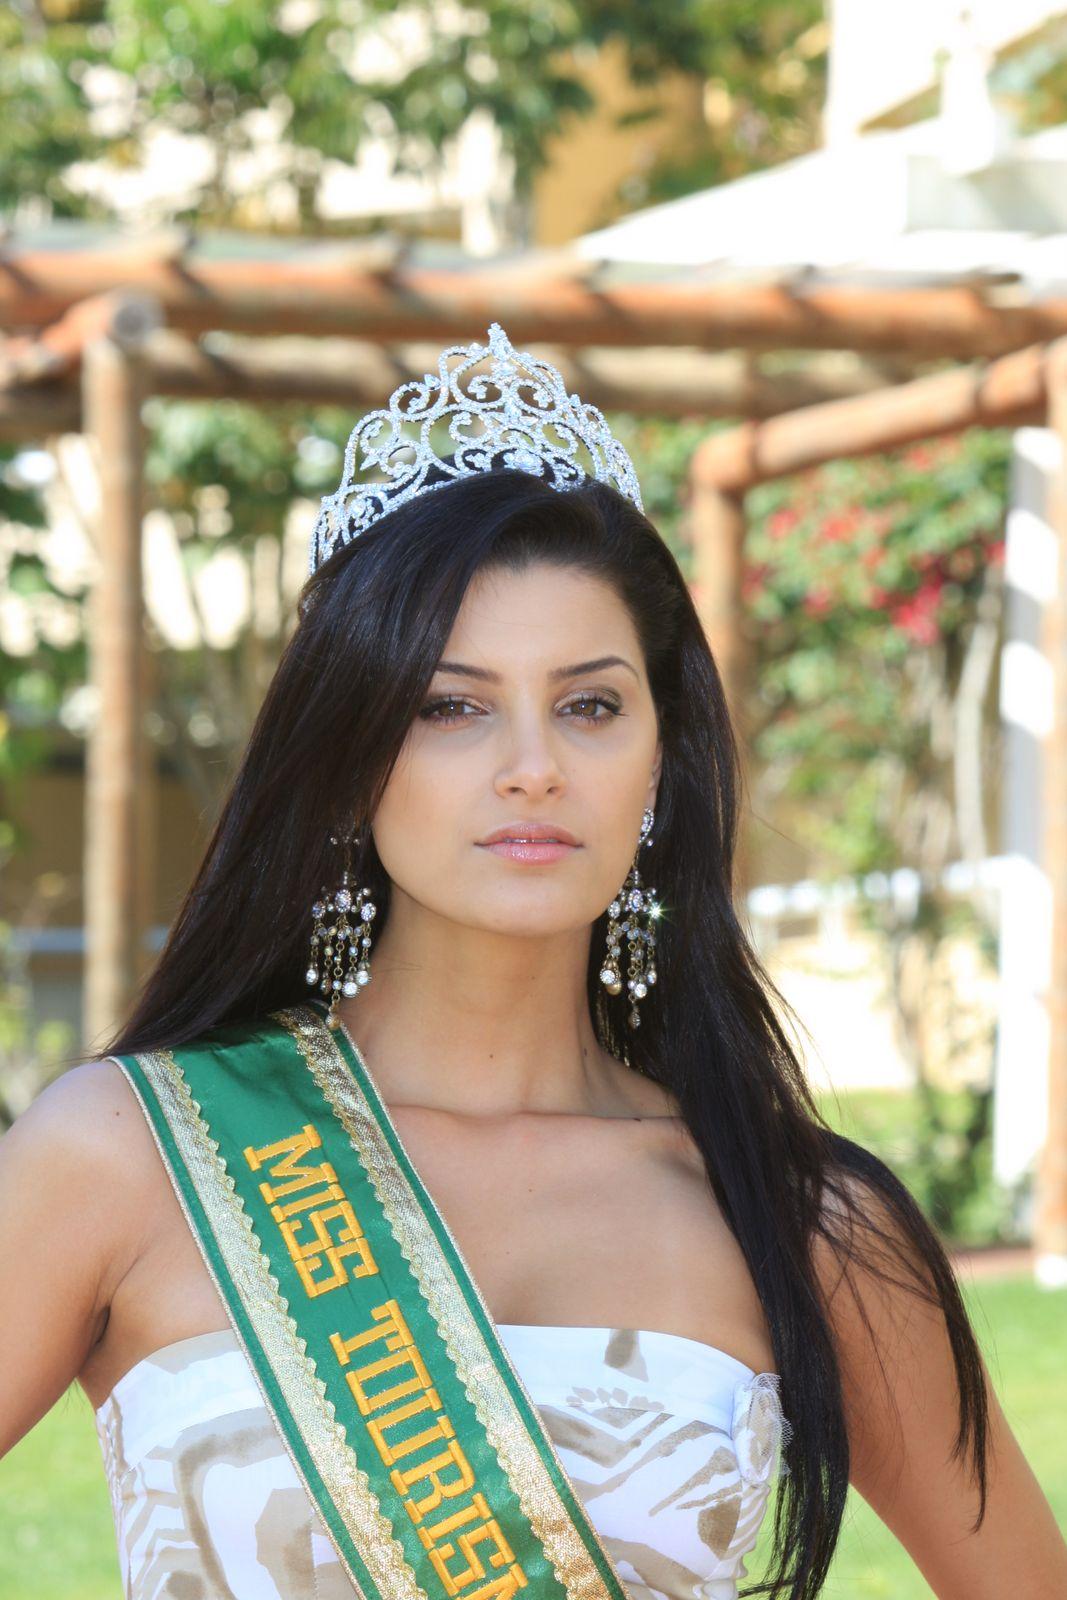 vivian noronha, rainha hispanoamericana 2008. suplente. - Página 4 Zdeud2eh